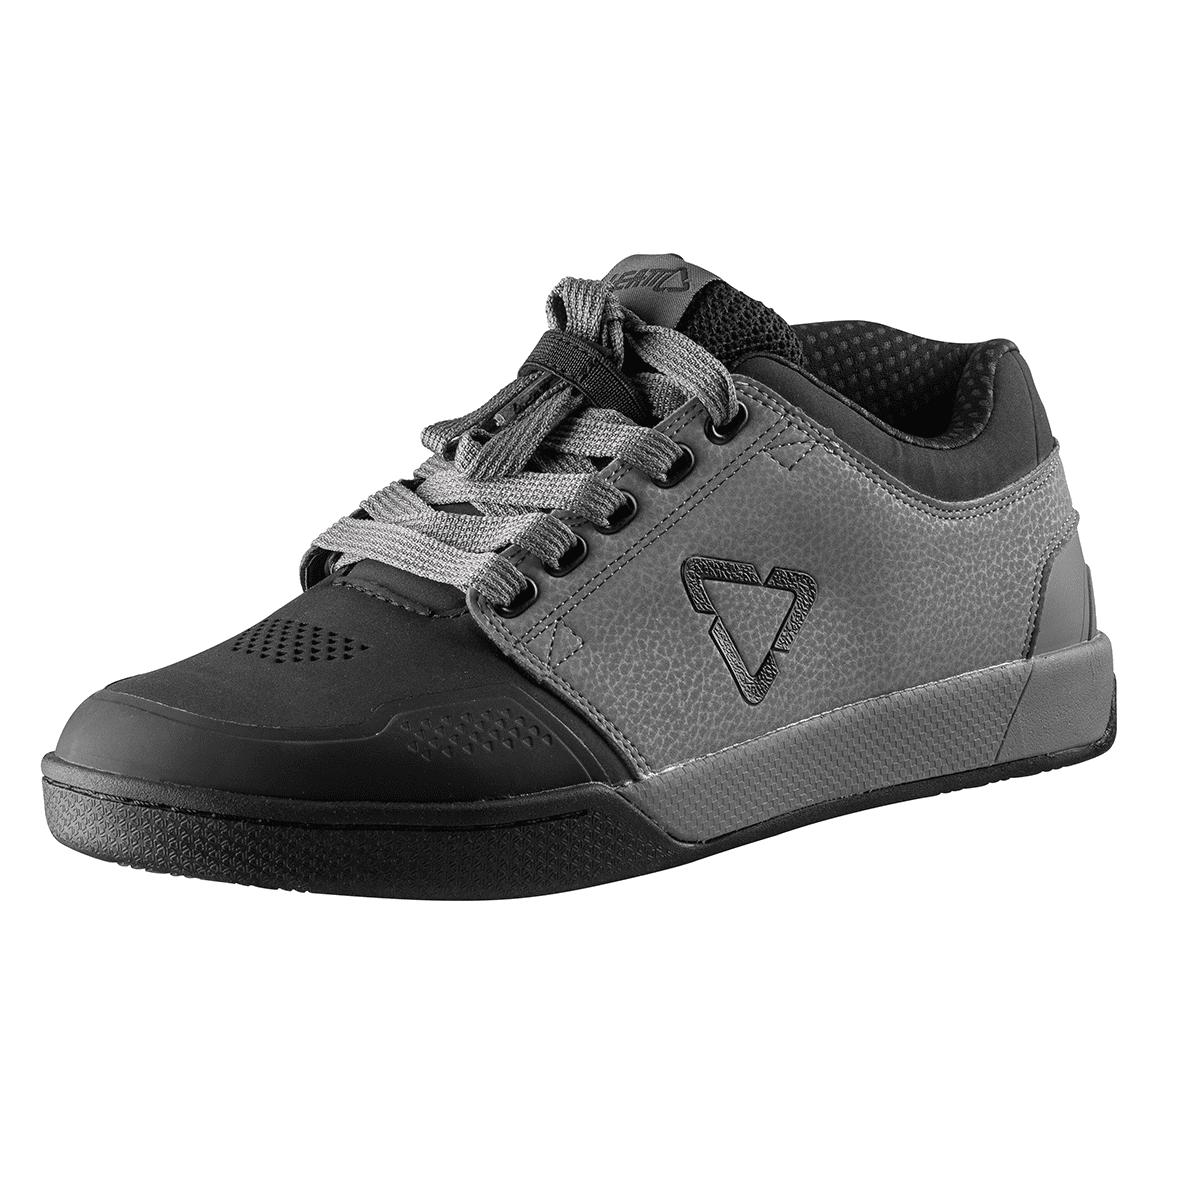 Leatt Leatt, DBX 2.0 Flat Shoes, Onyx - 8.5